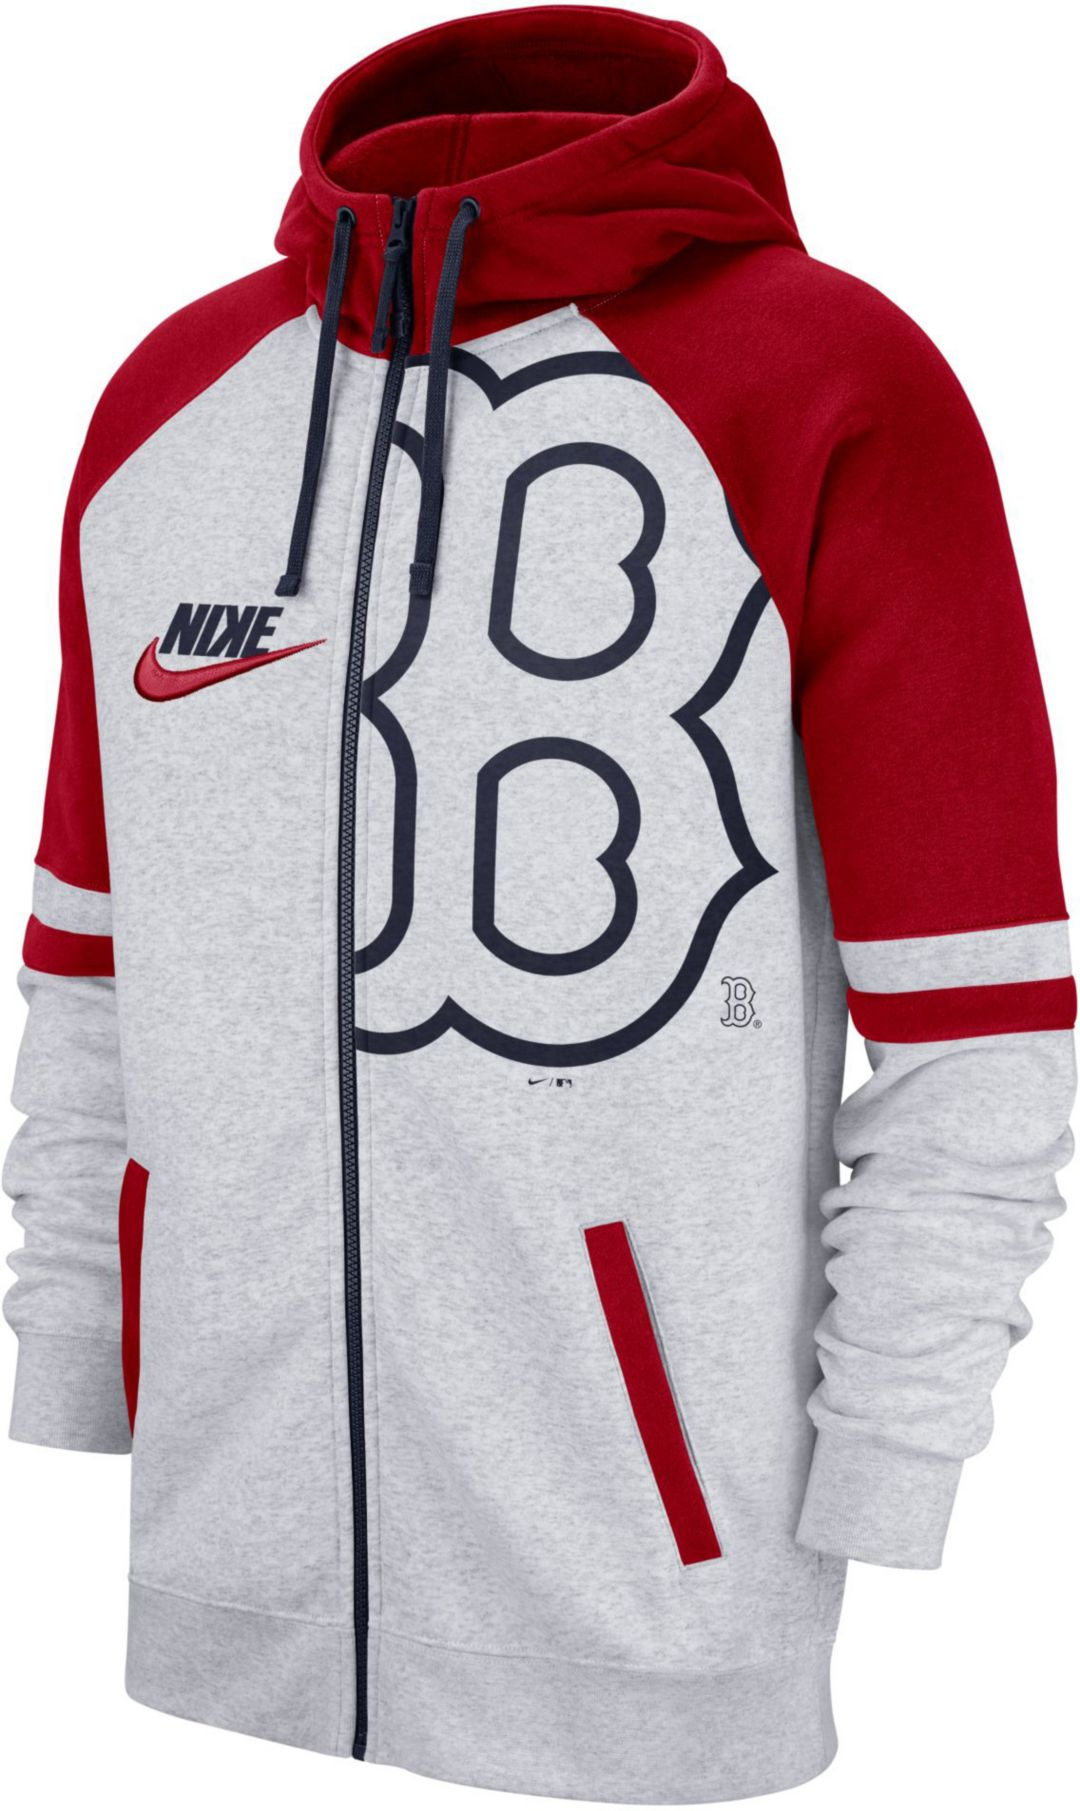 the best attitude ee83d 7e3ed Nike Men's Boston Red Sox Full-Zip Hoodie